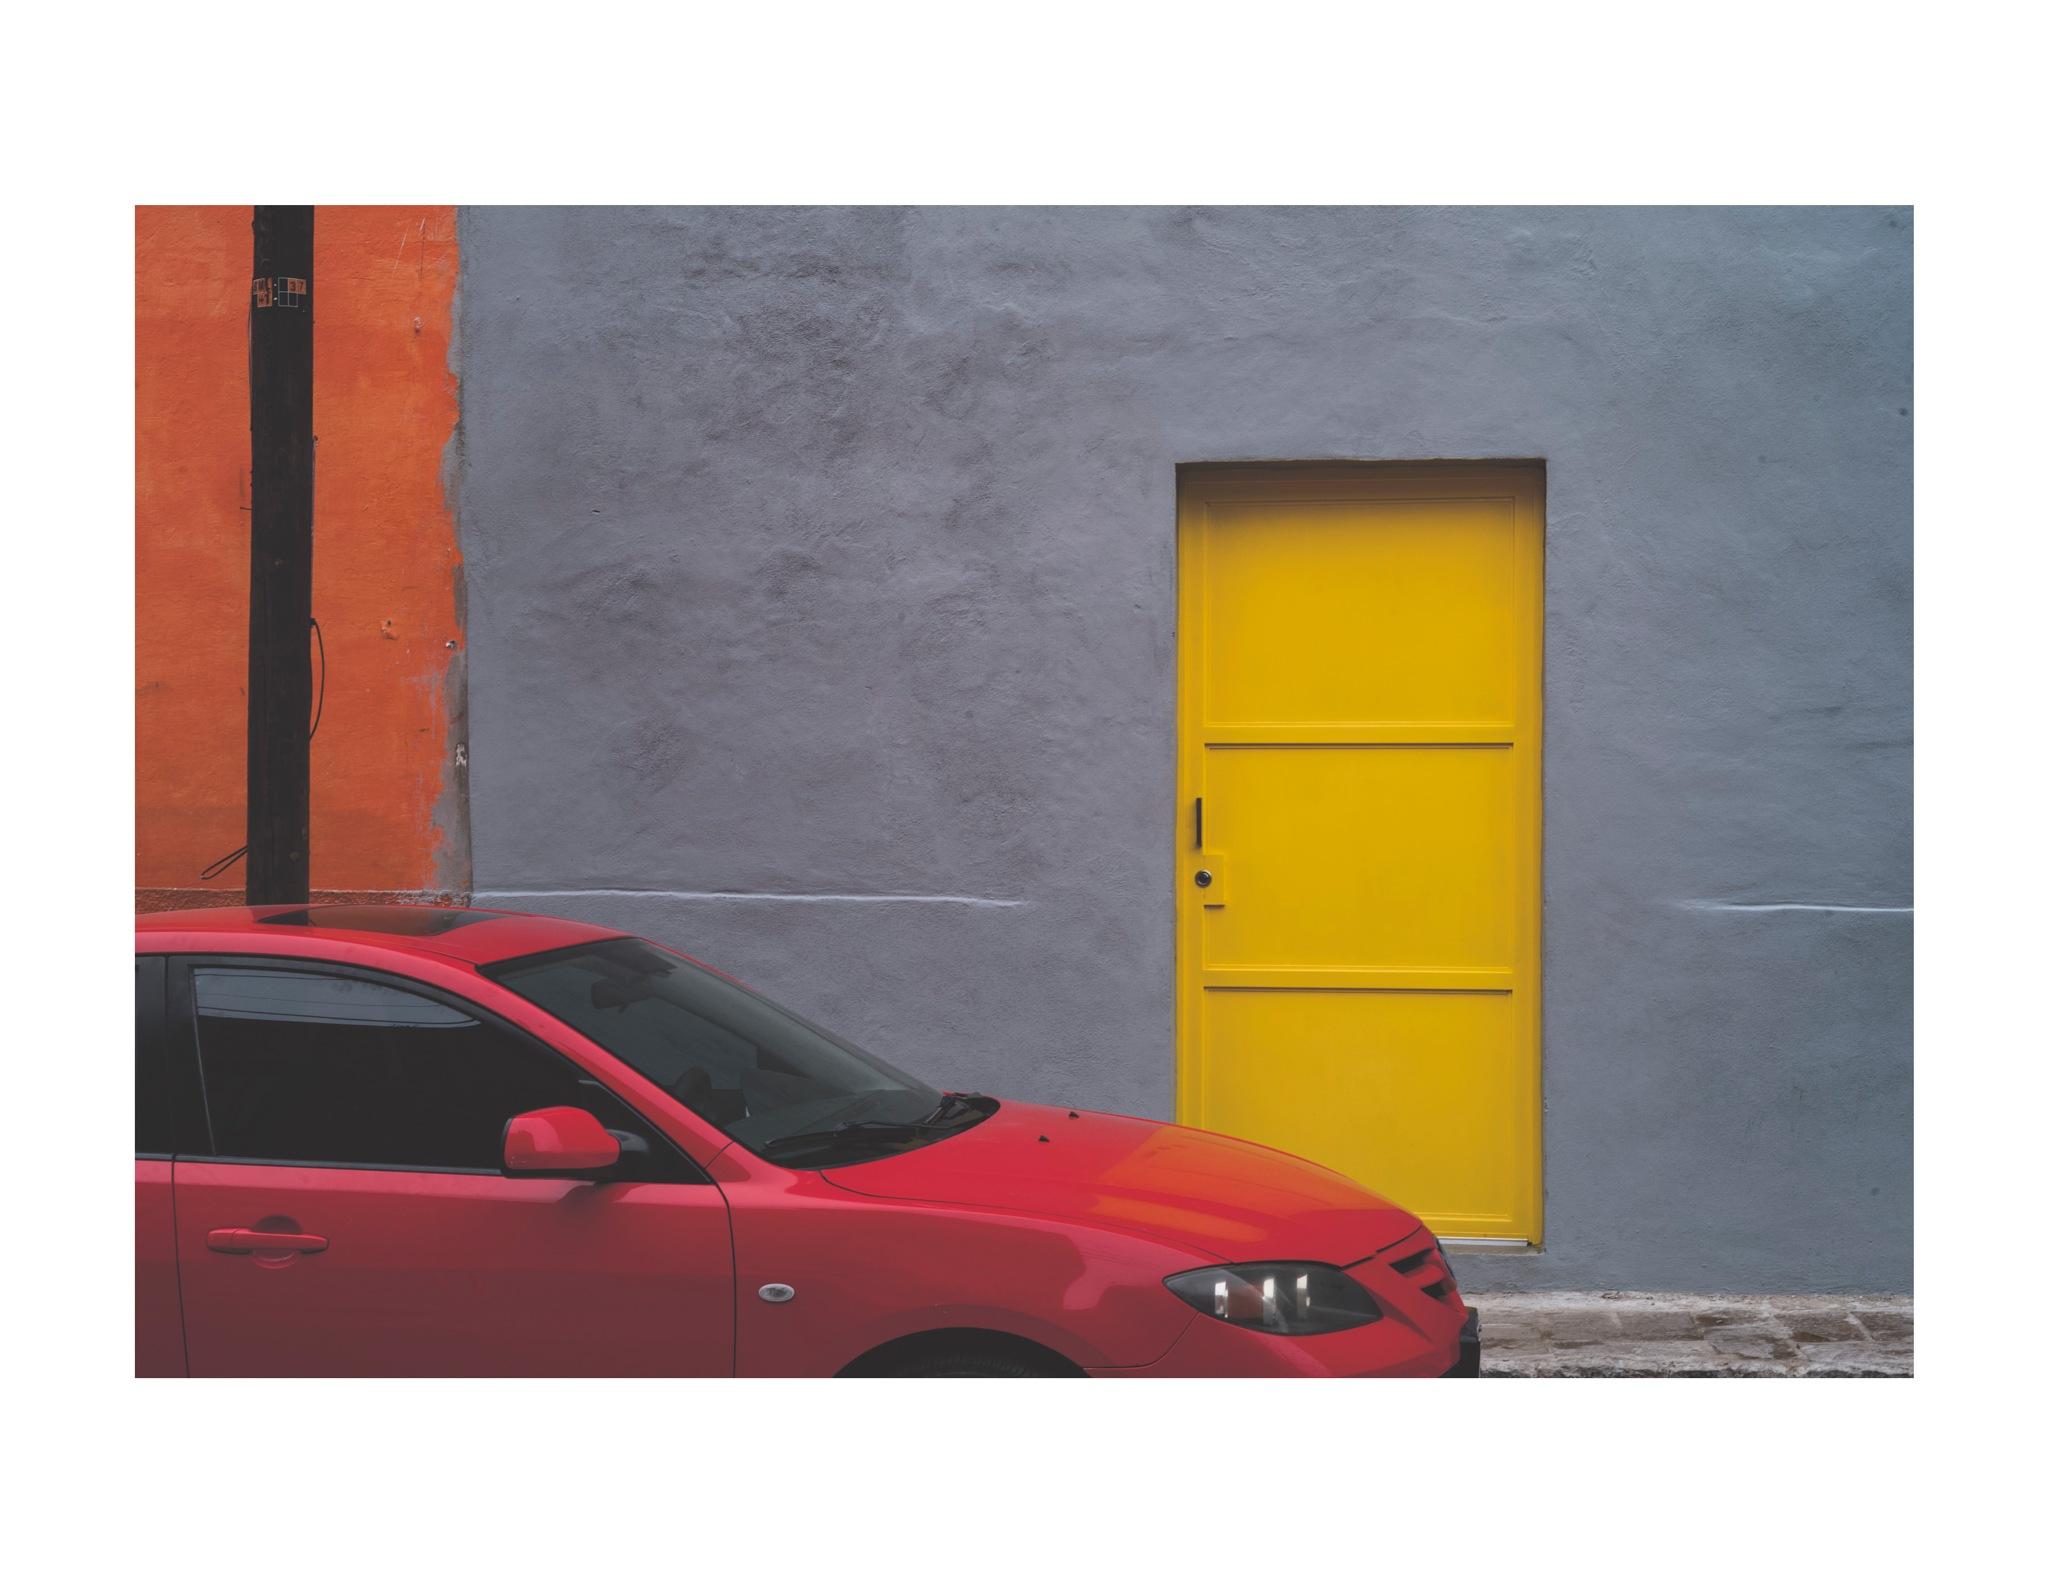 Yellow Door by jhulton